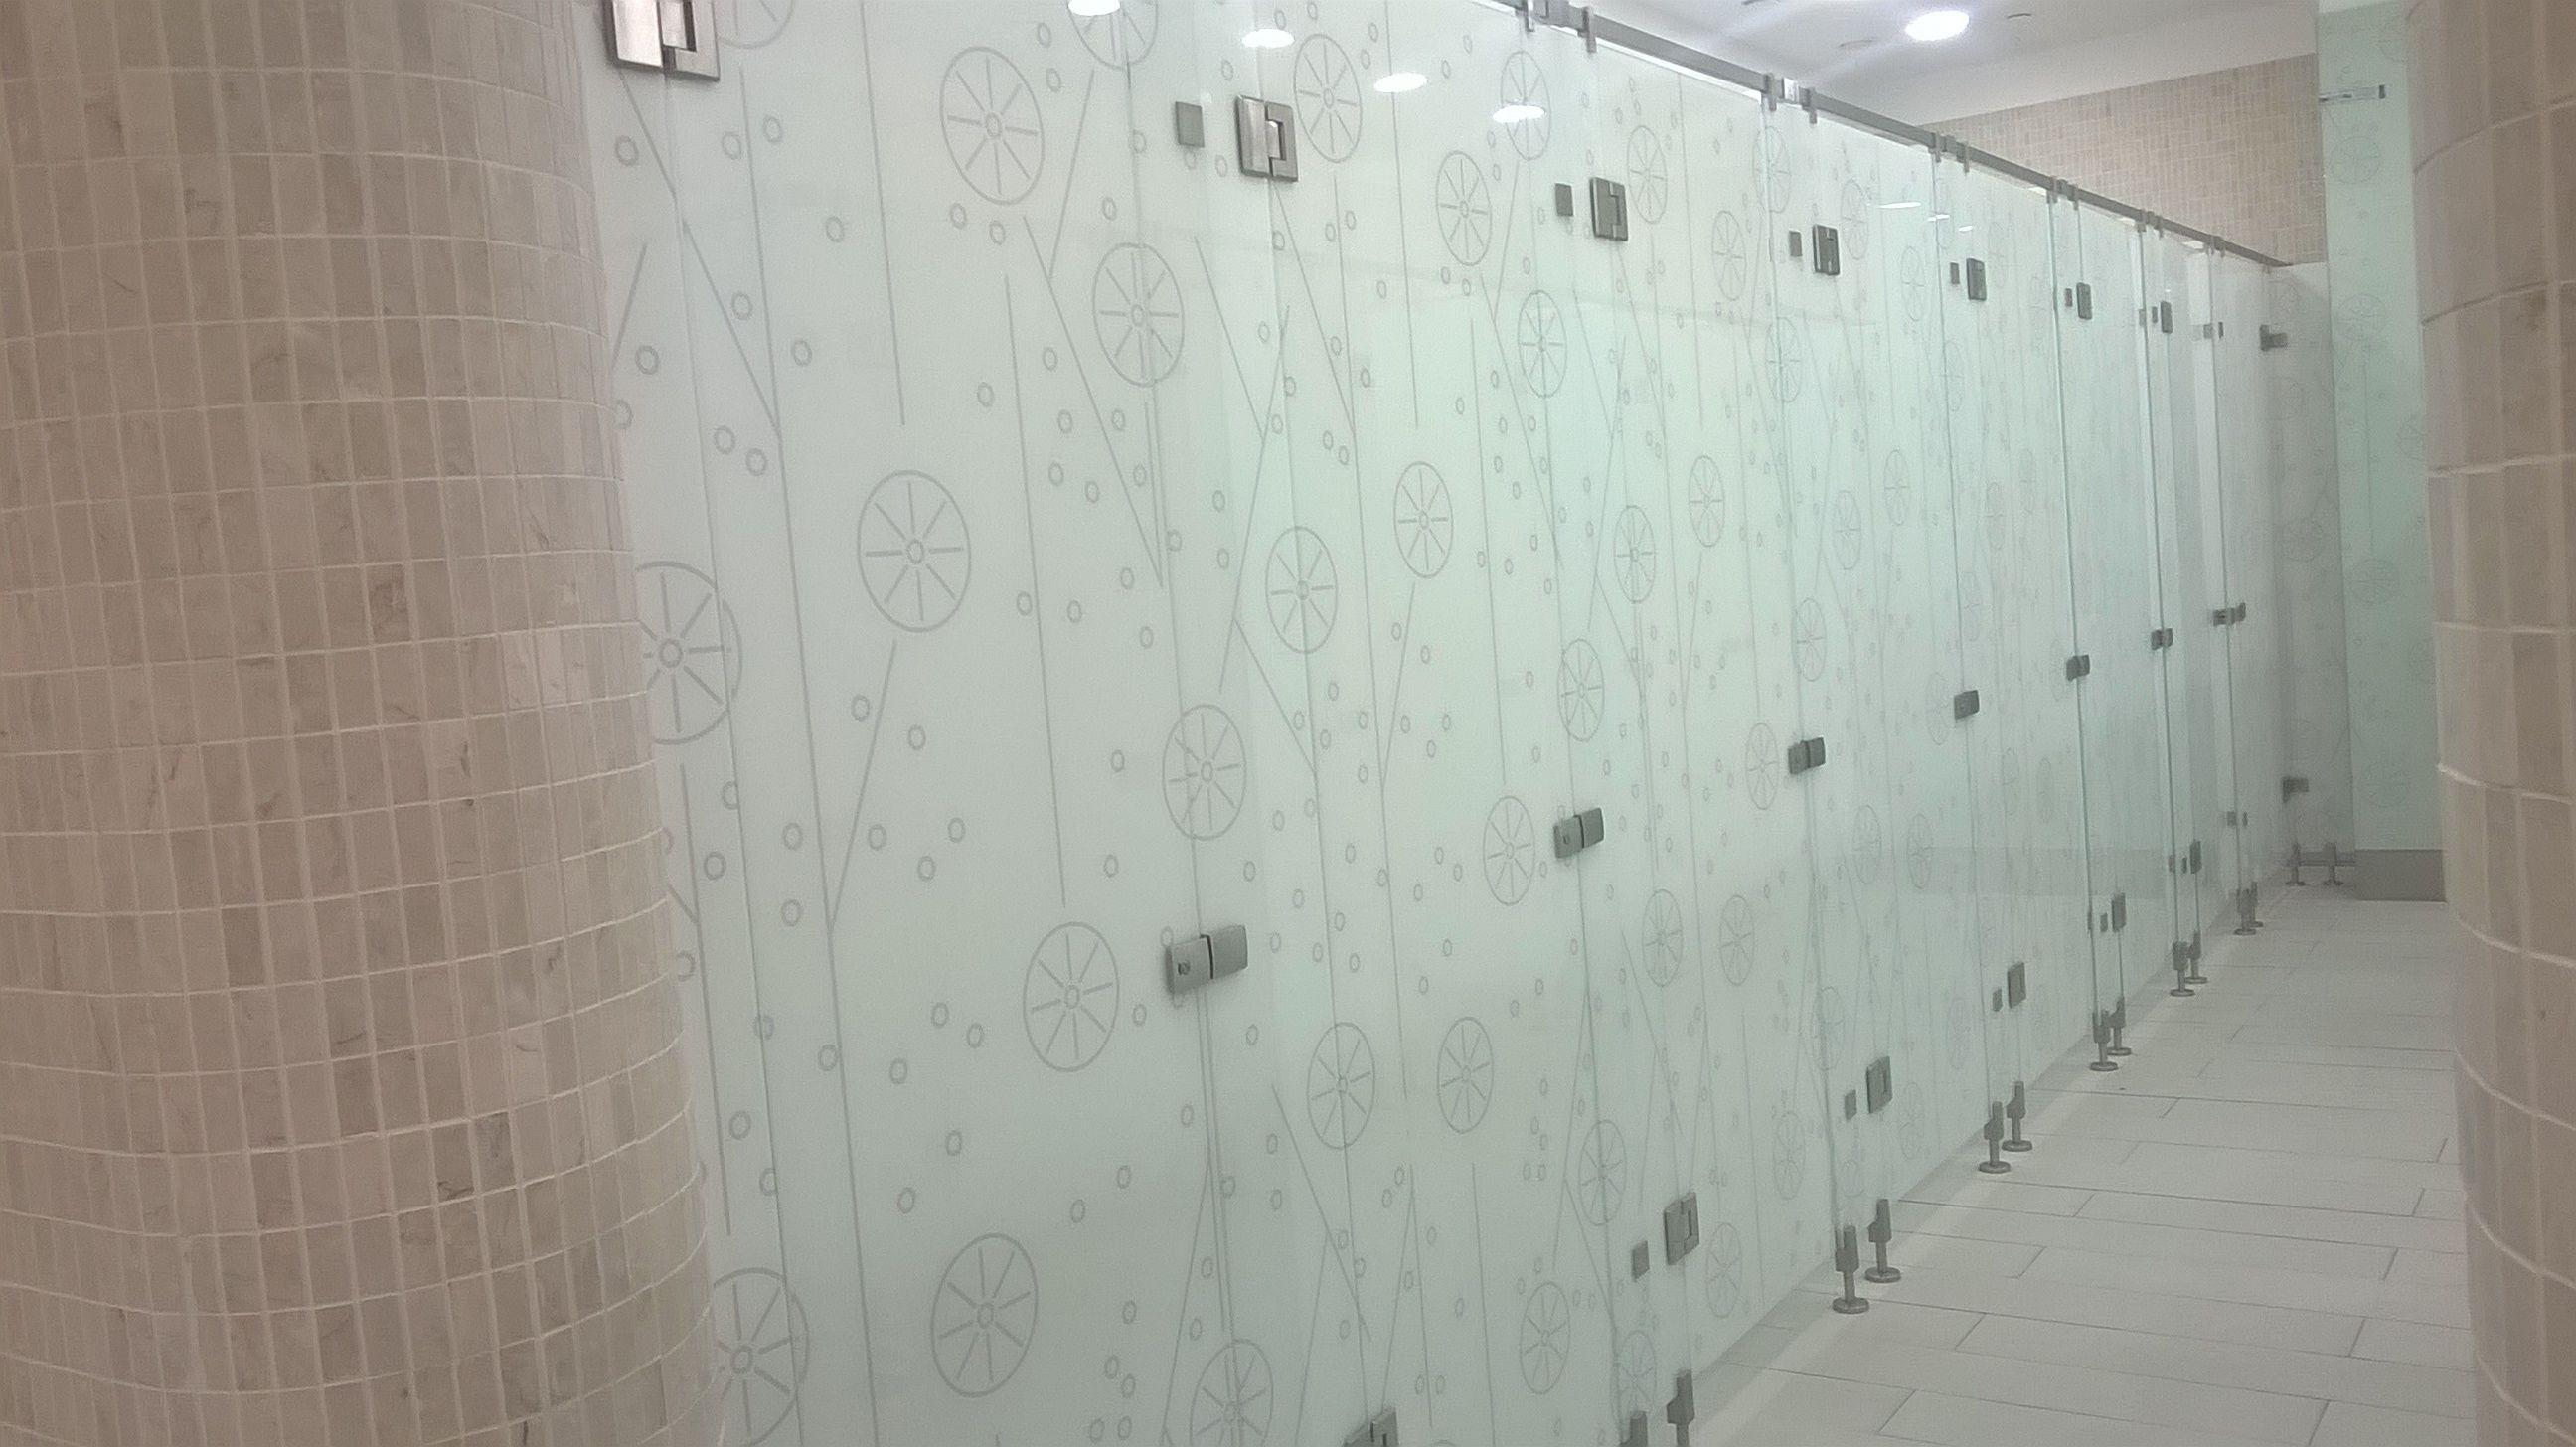 Toaleta-cu-sticla-laminata-cu-print-la-interior